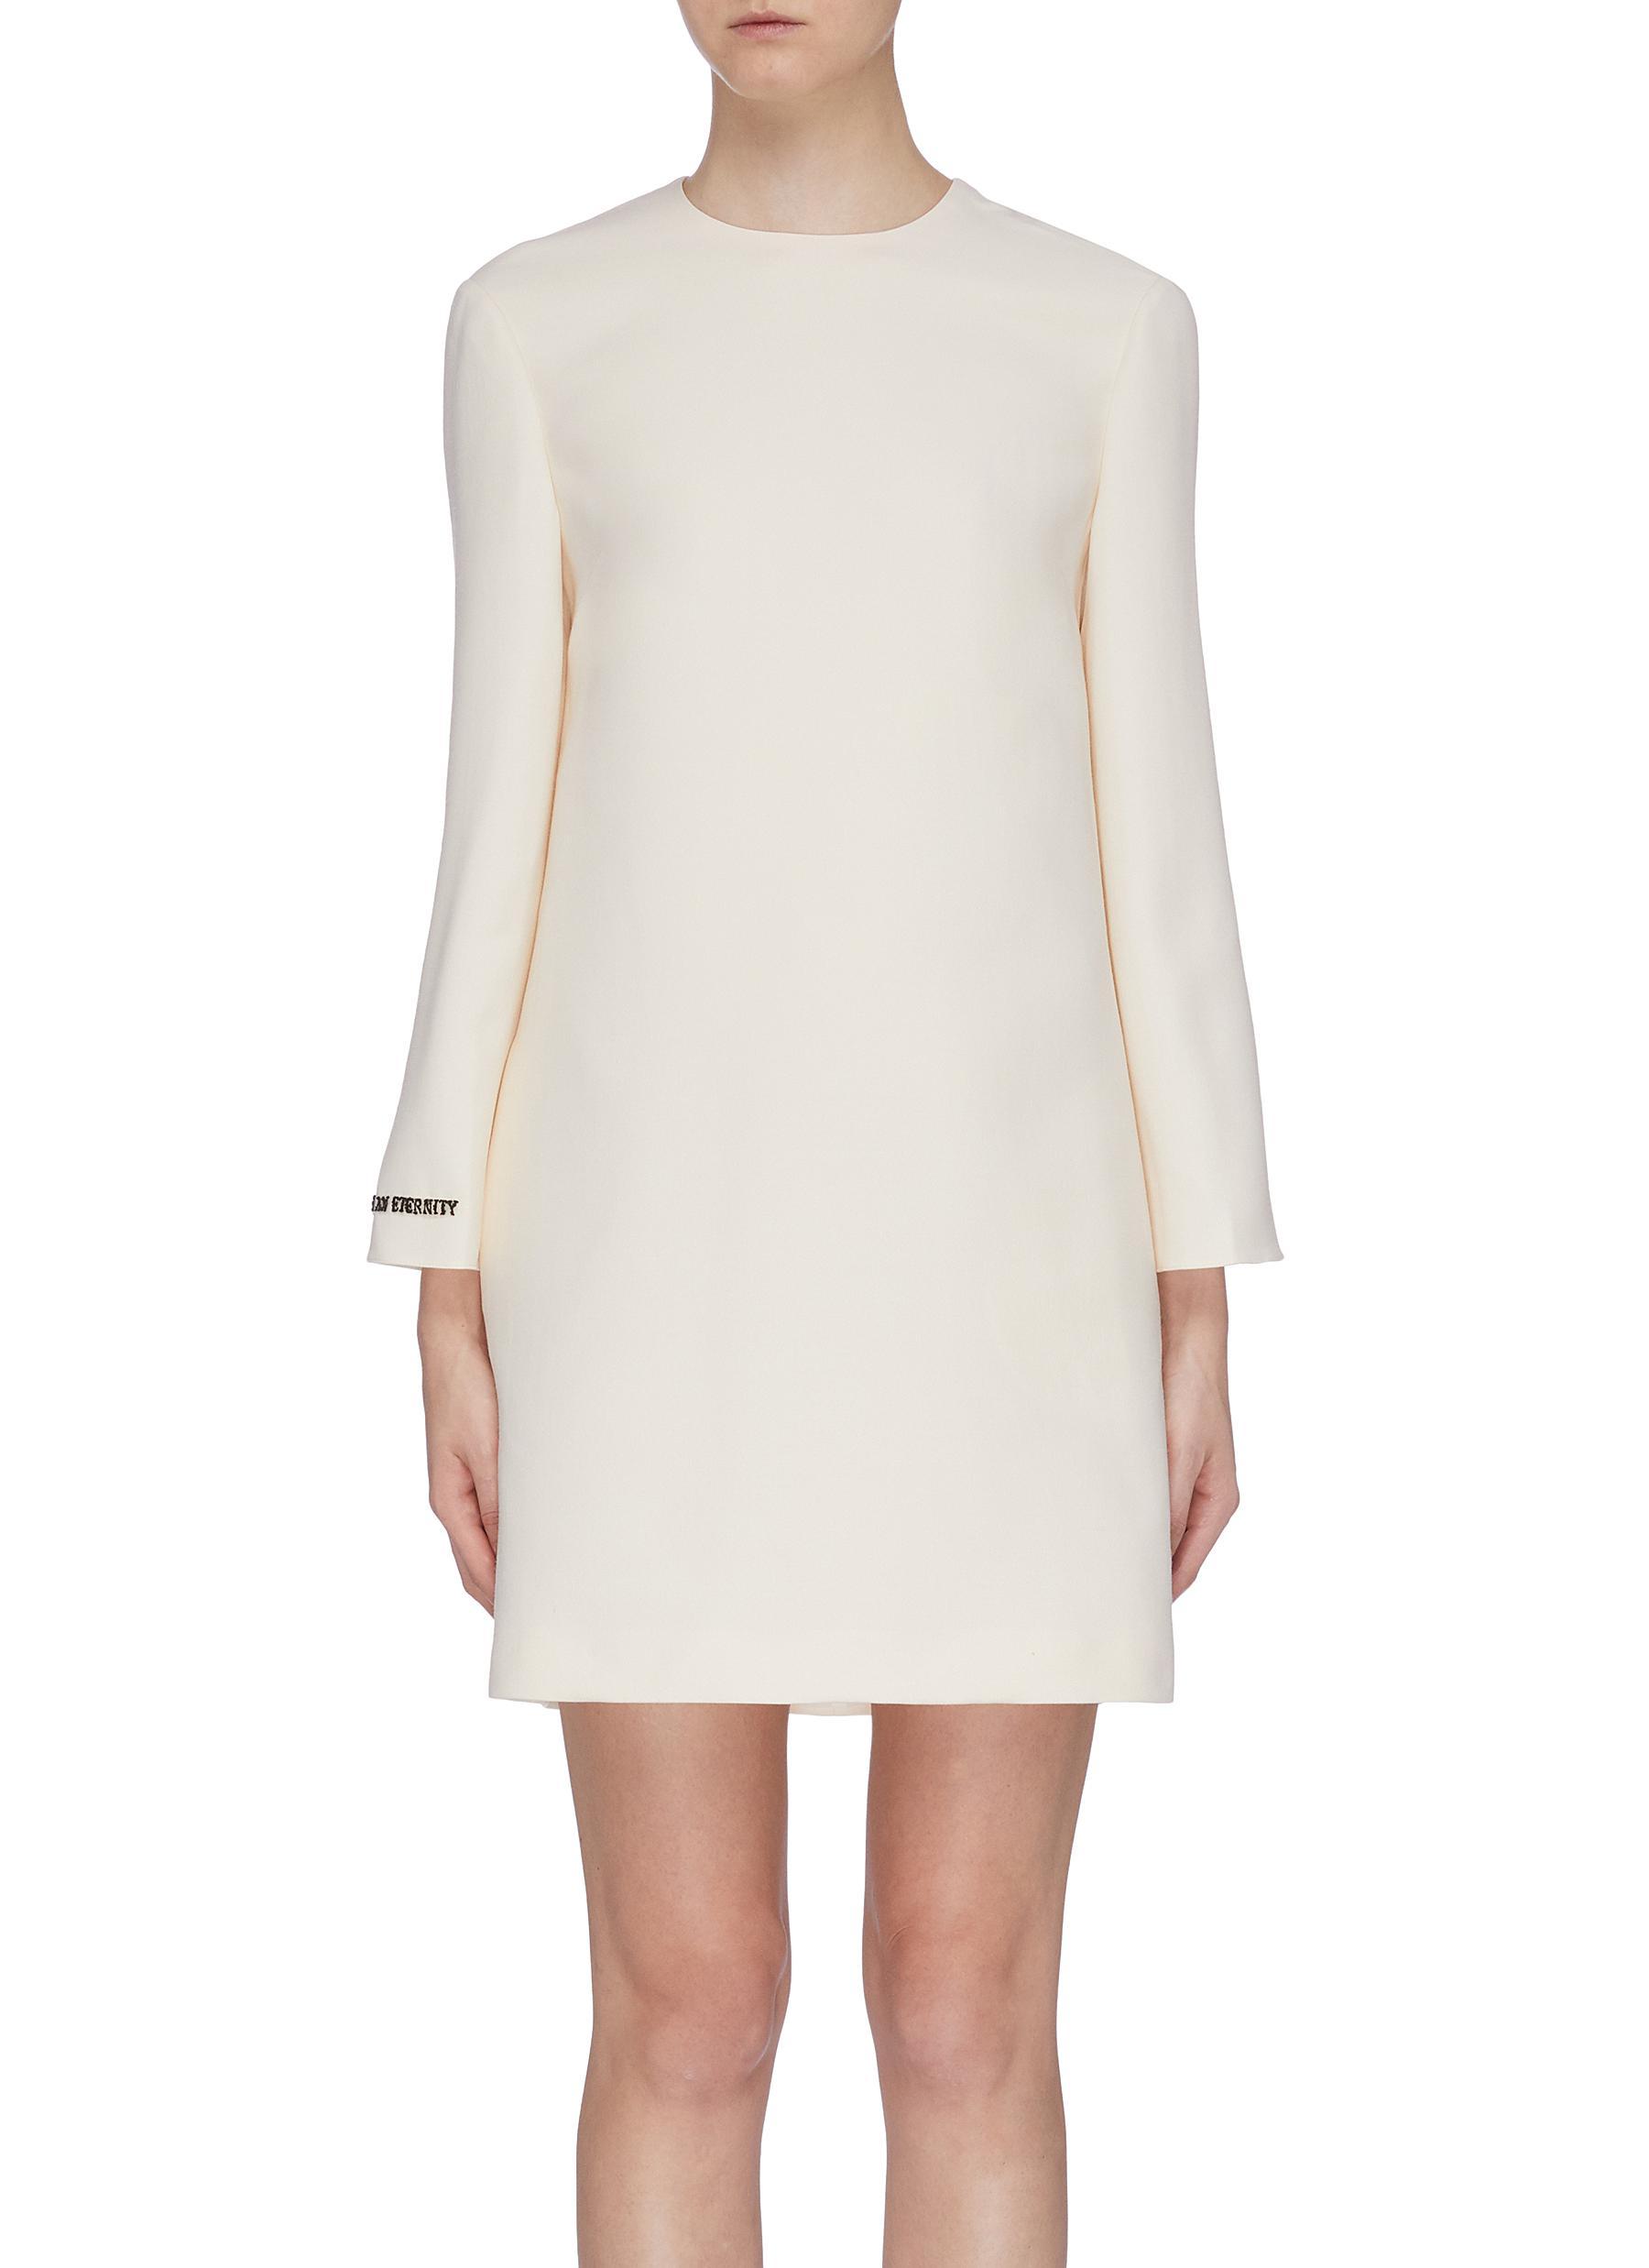 Slogan embellished long sleeve dress by Valentino